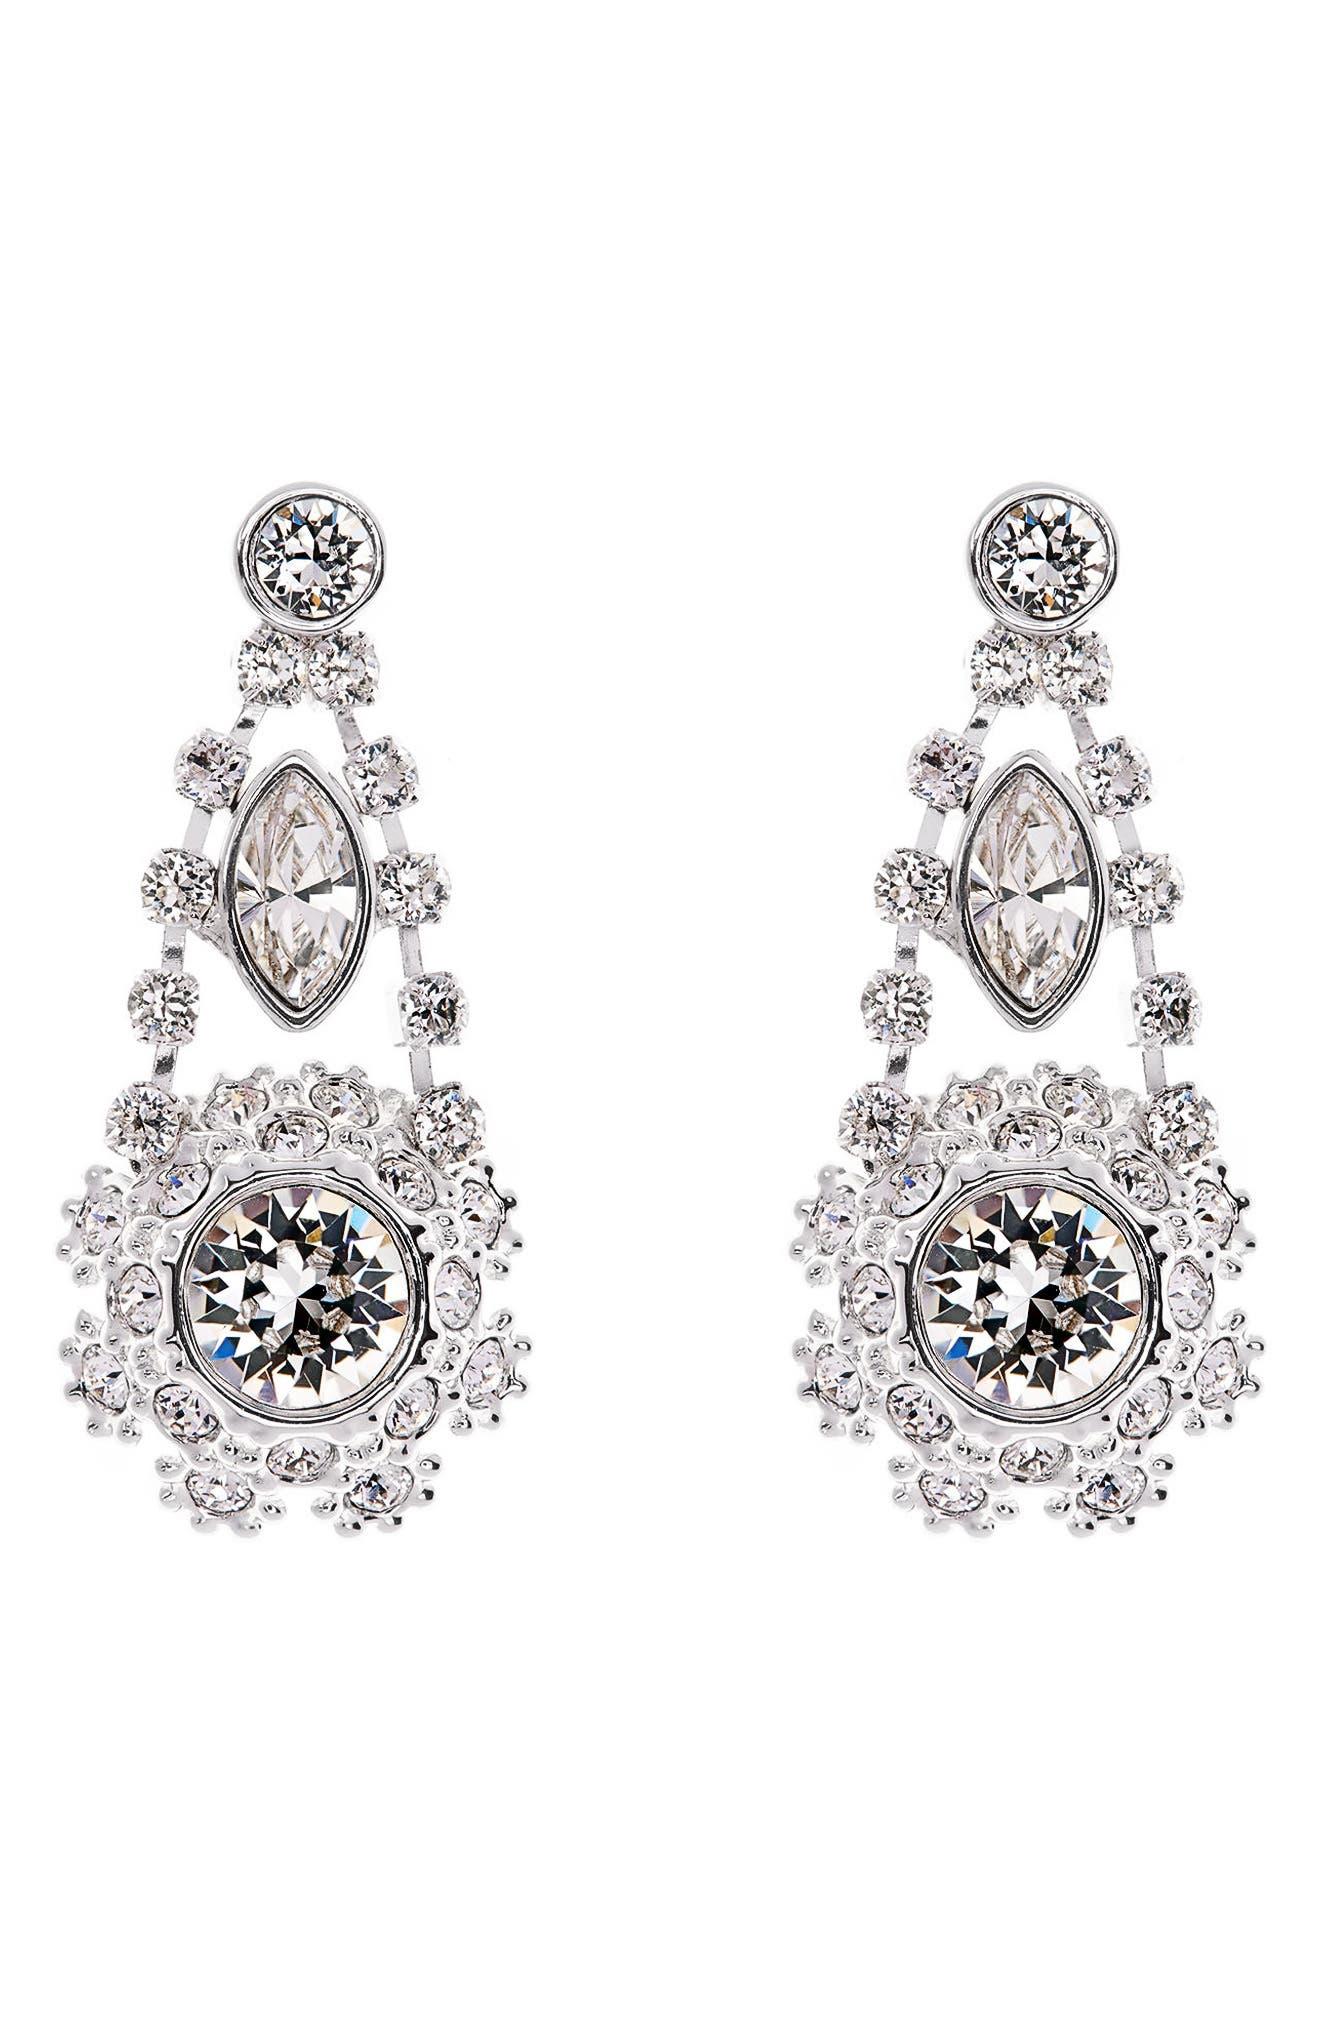 Crystal Daisy Lace Drop Earrings,                             Main thumbnail 1, color,                             Clear